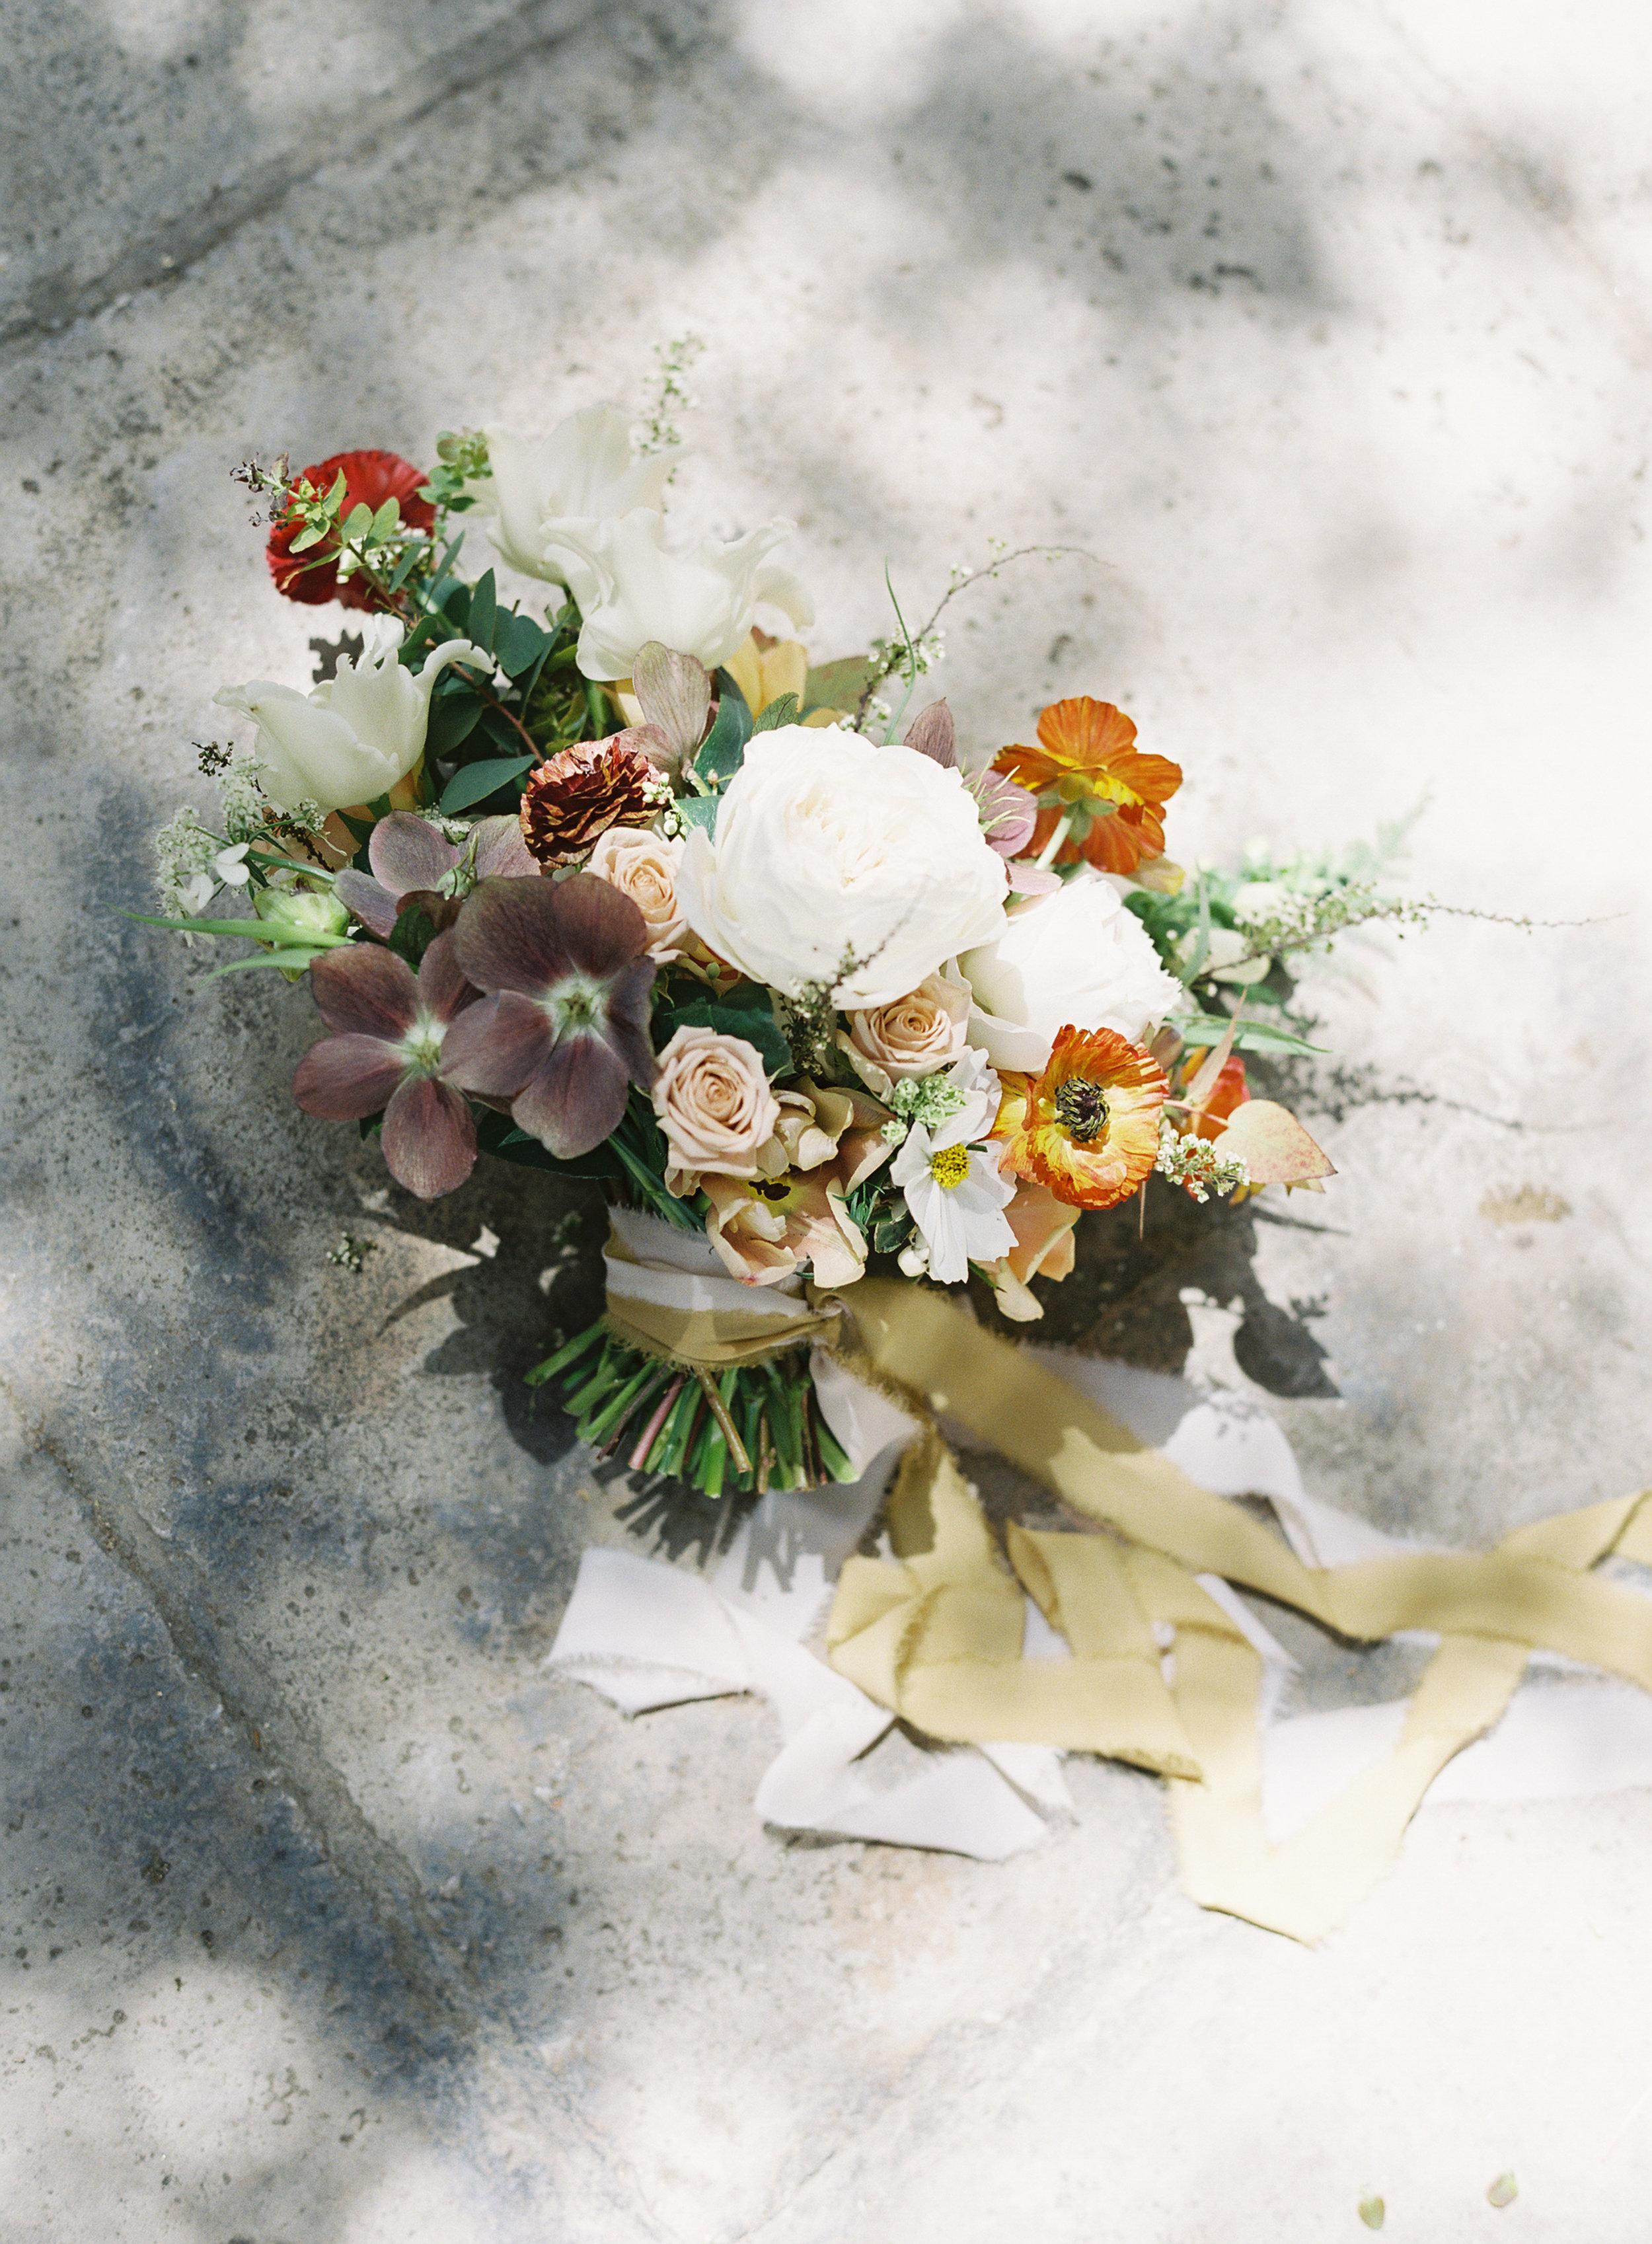 California Wedding Inspiration Fine Art Flowers Modern Romantic Finding Flora florist Sara Weir Bridal Bouquet Organic Silk Ribbon Magnolia Rouge